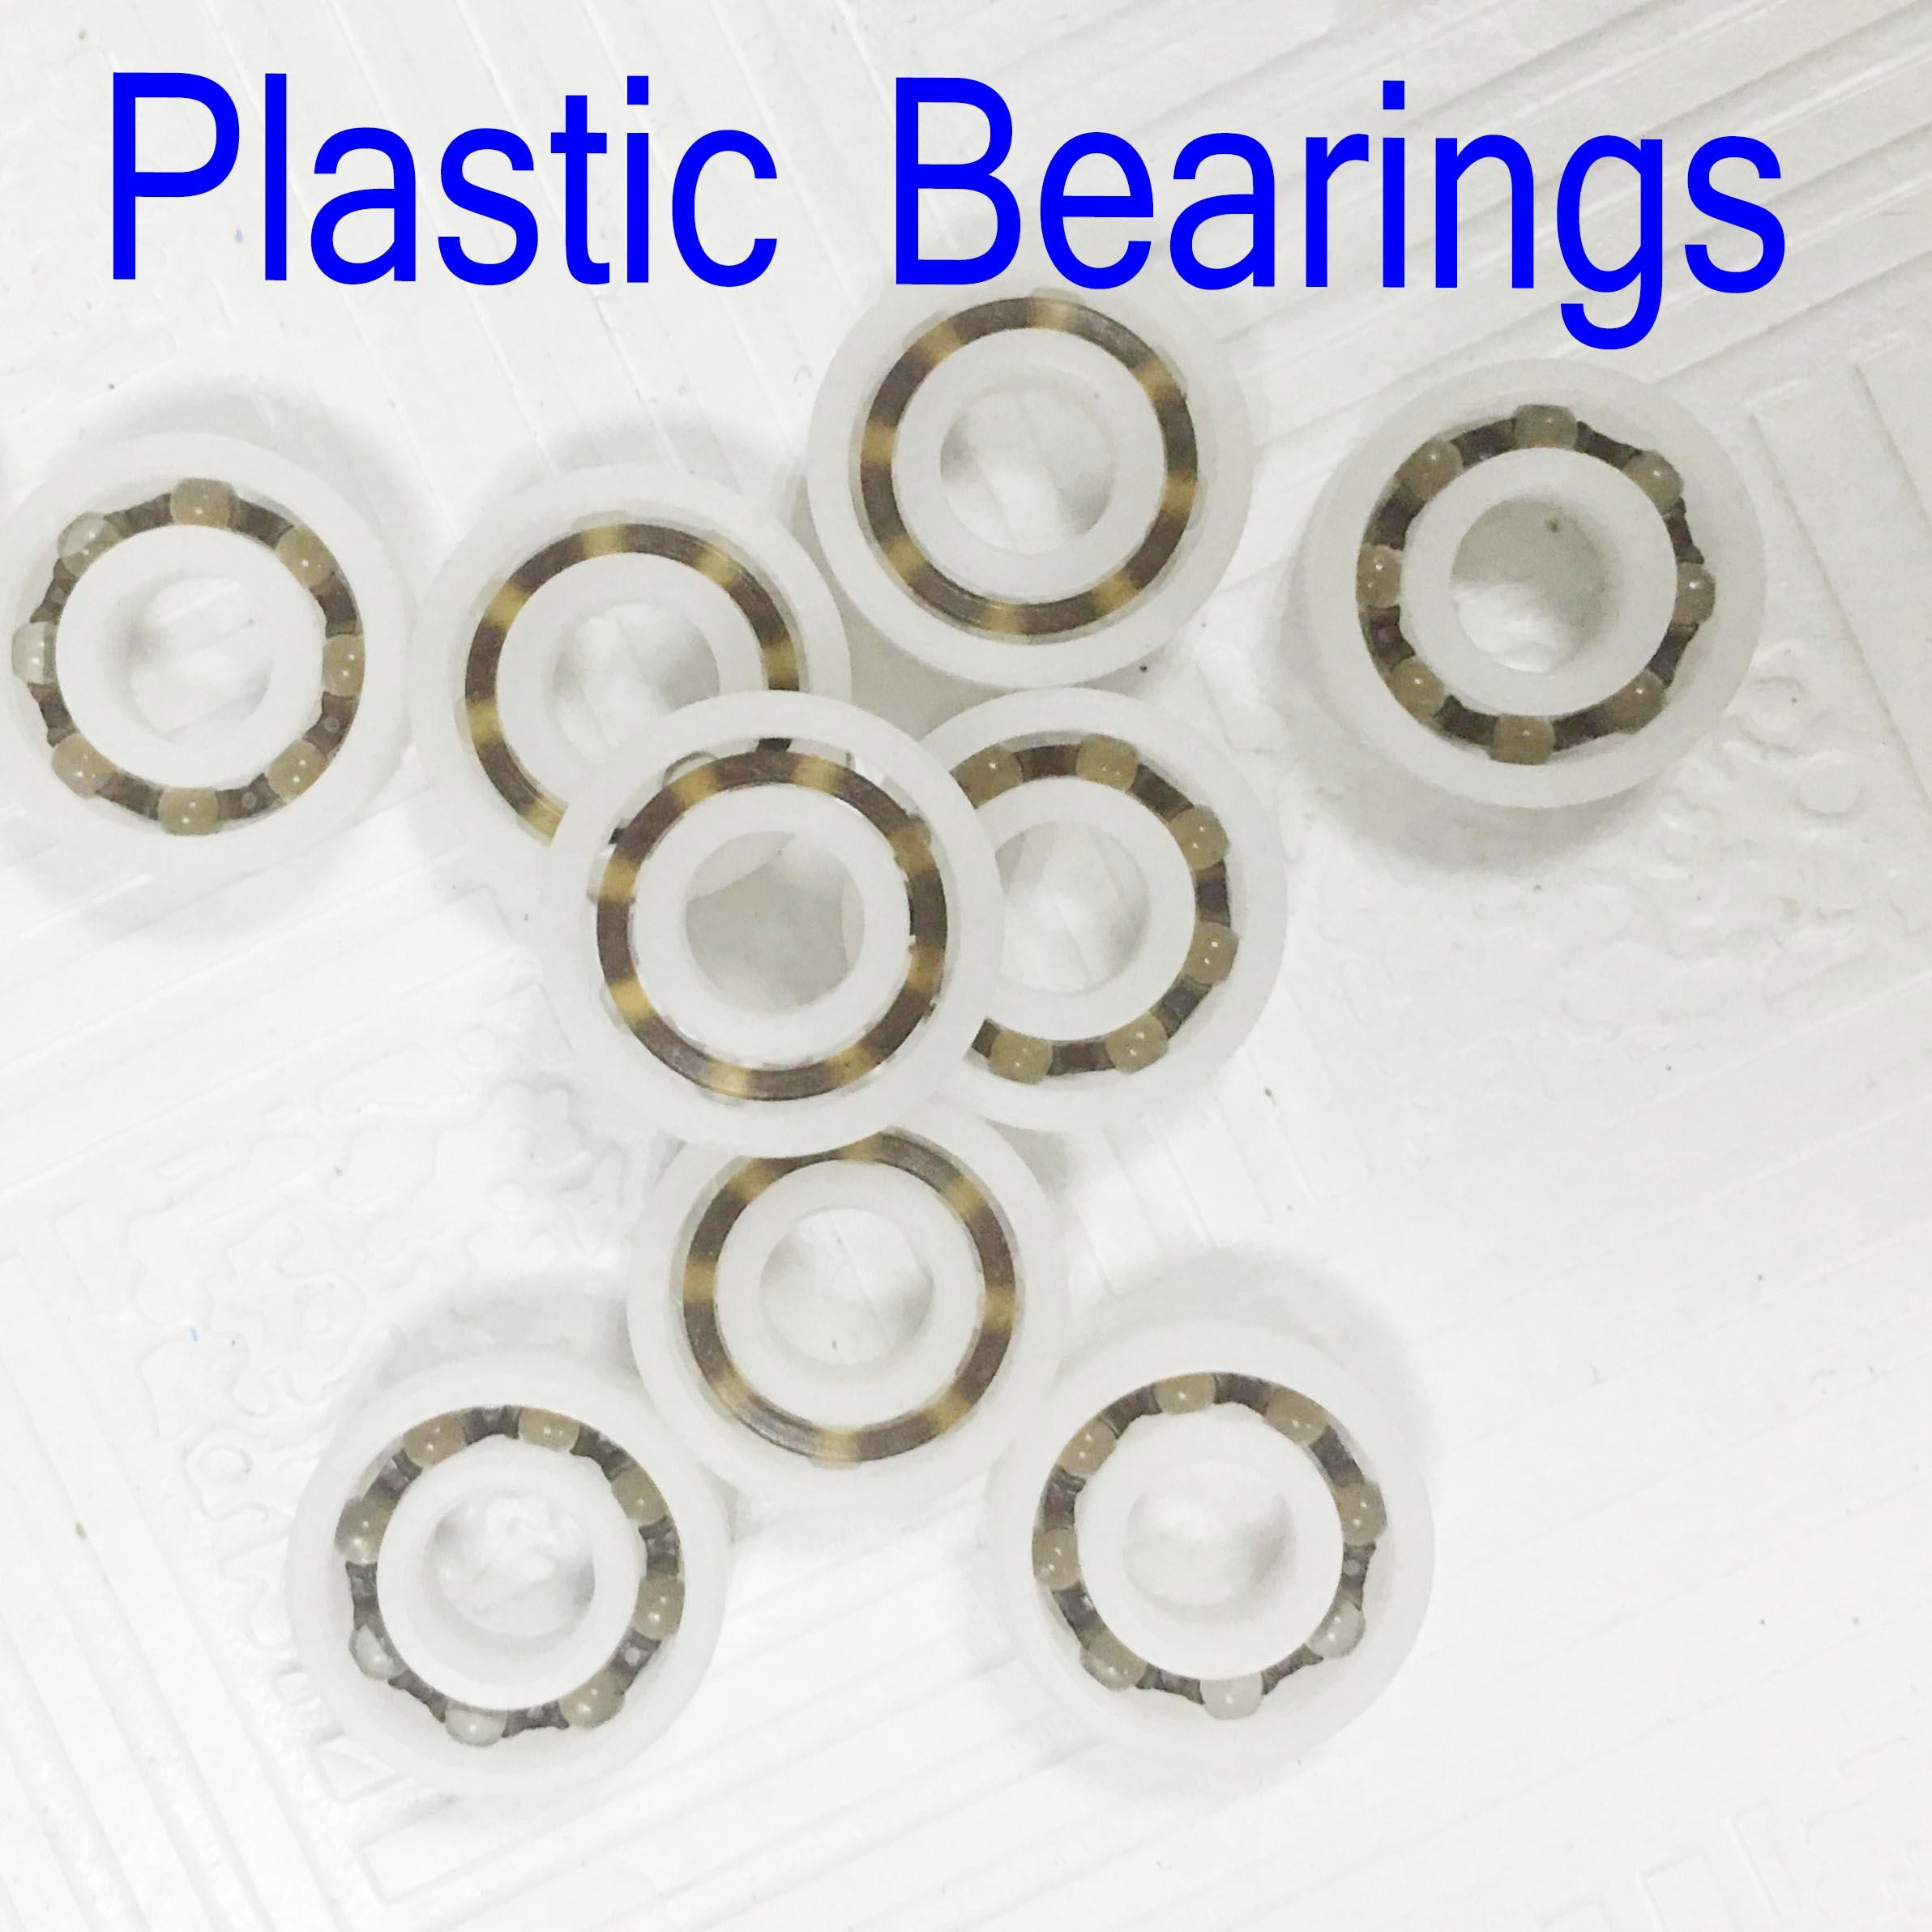 6009 POM (10PCS)  Plastic bearings 45x75x16 Glass Balls 45mm/75mm/16mm 6809 pom 10pcs plastic ball bearings 45x58x7 glass balls 45mm 58mm 7mm 61809pom